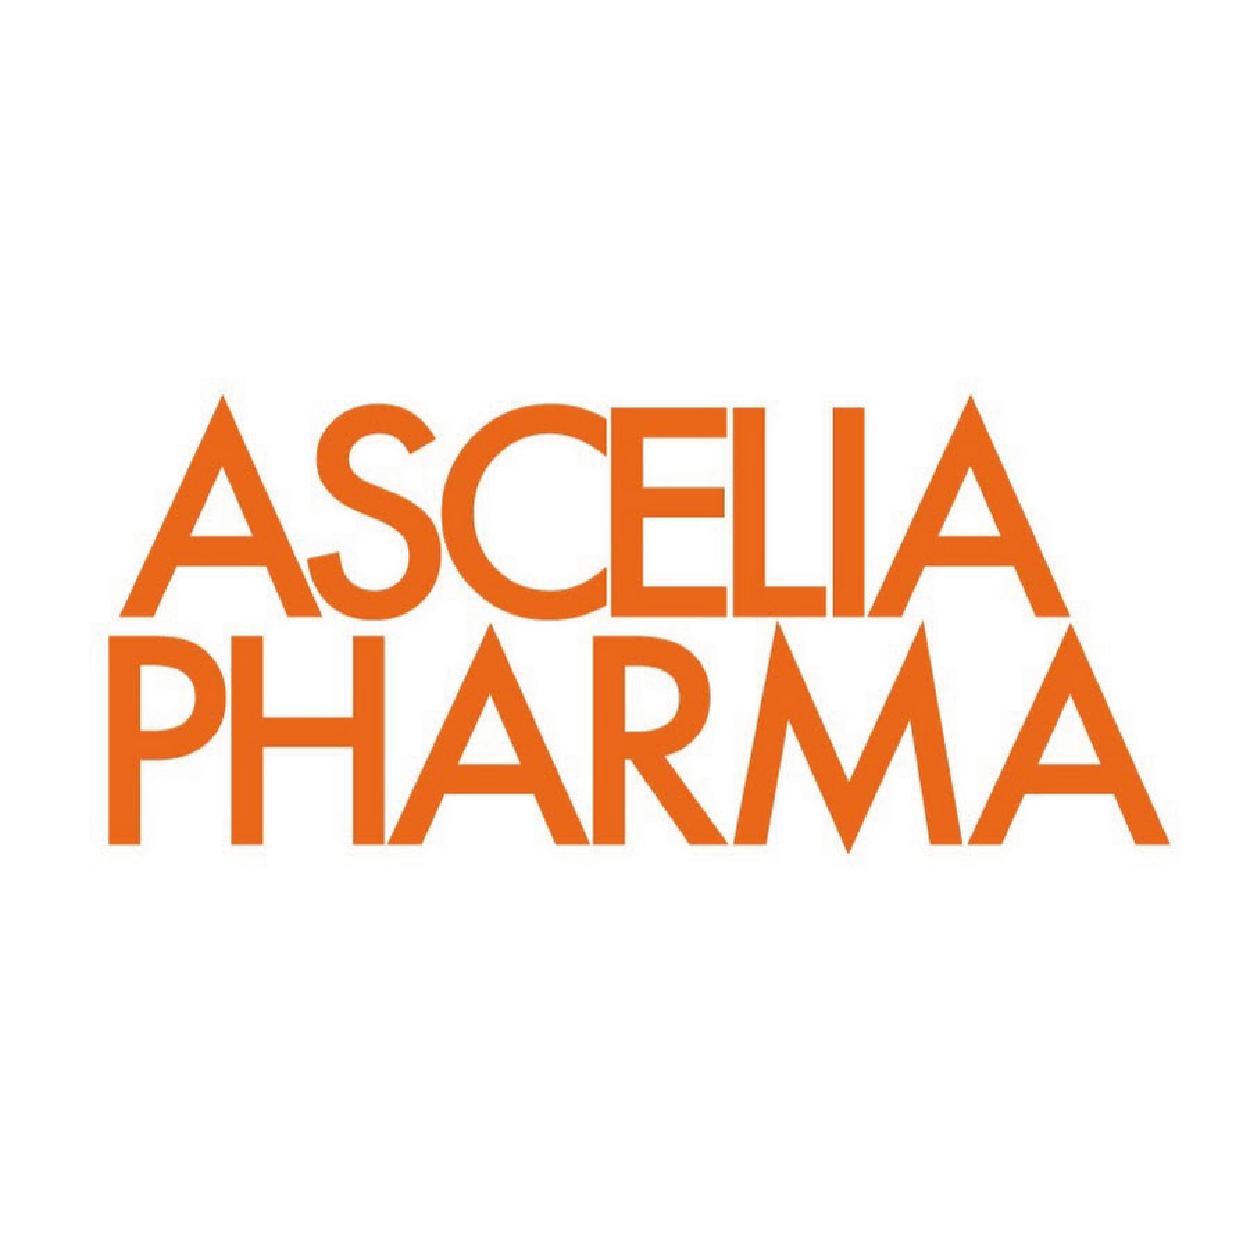 Ascelia Pharma